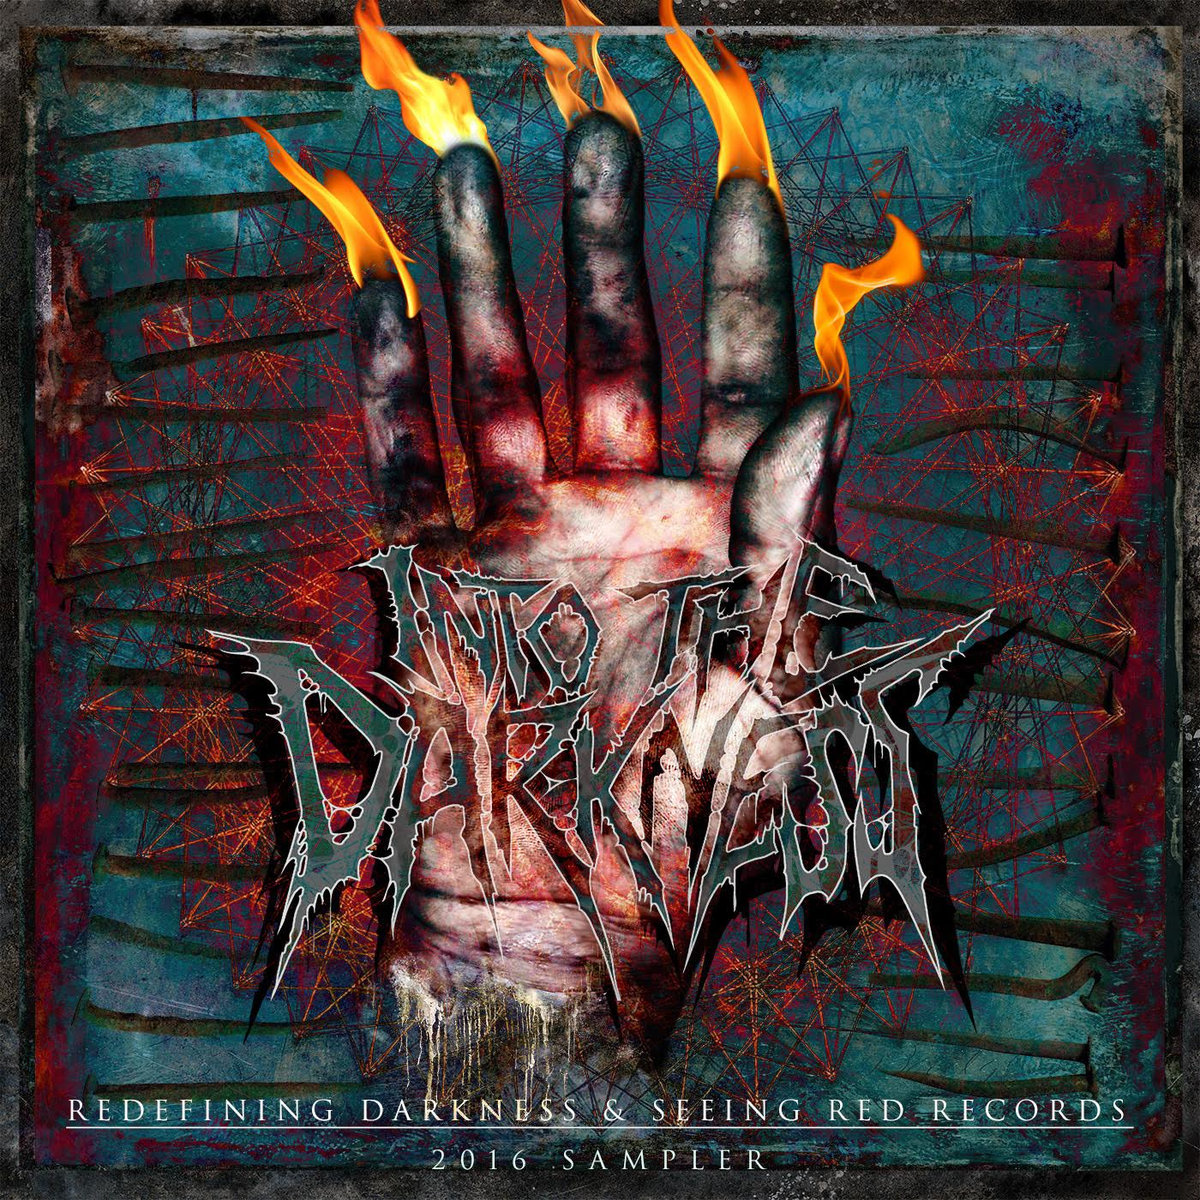 Redefining Darkness & Seeing Red Records Sampler